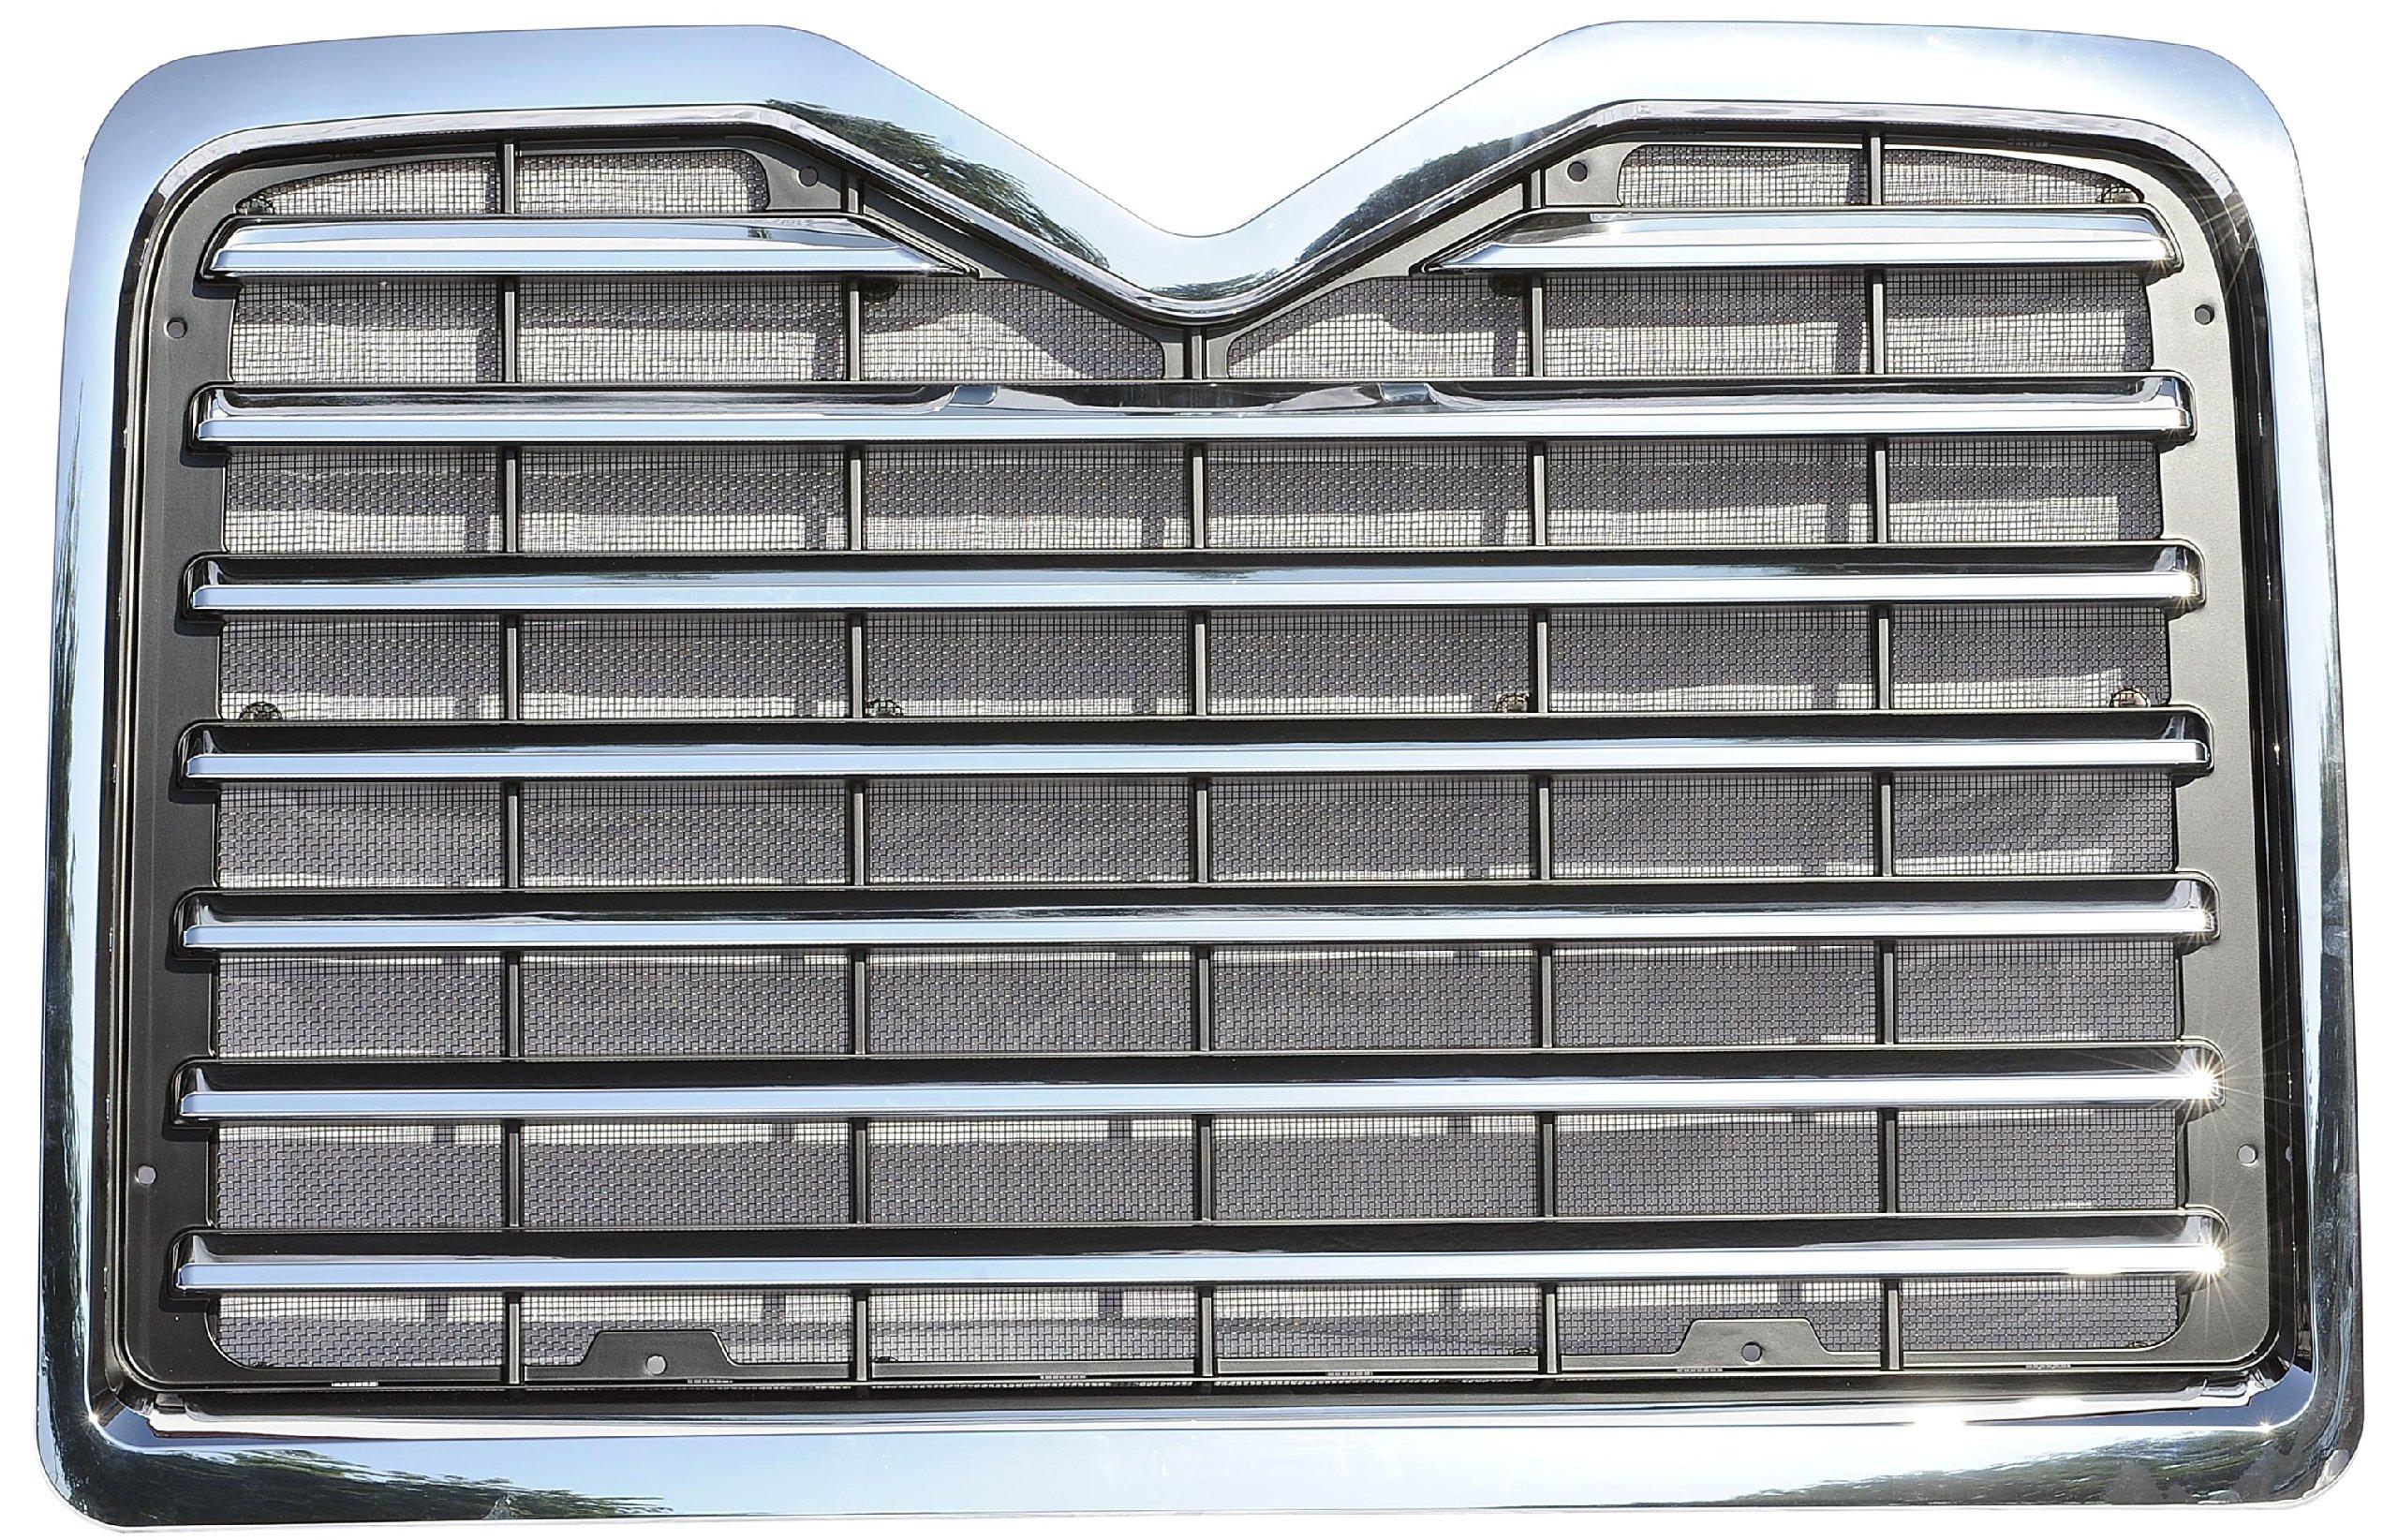 Dorman 242-5502 Mack Radiator Grille